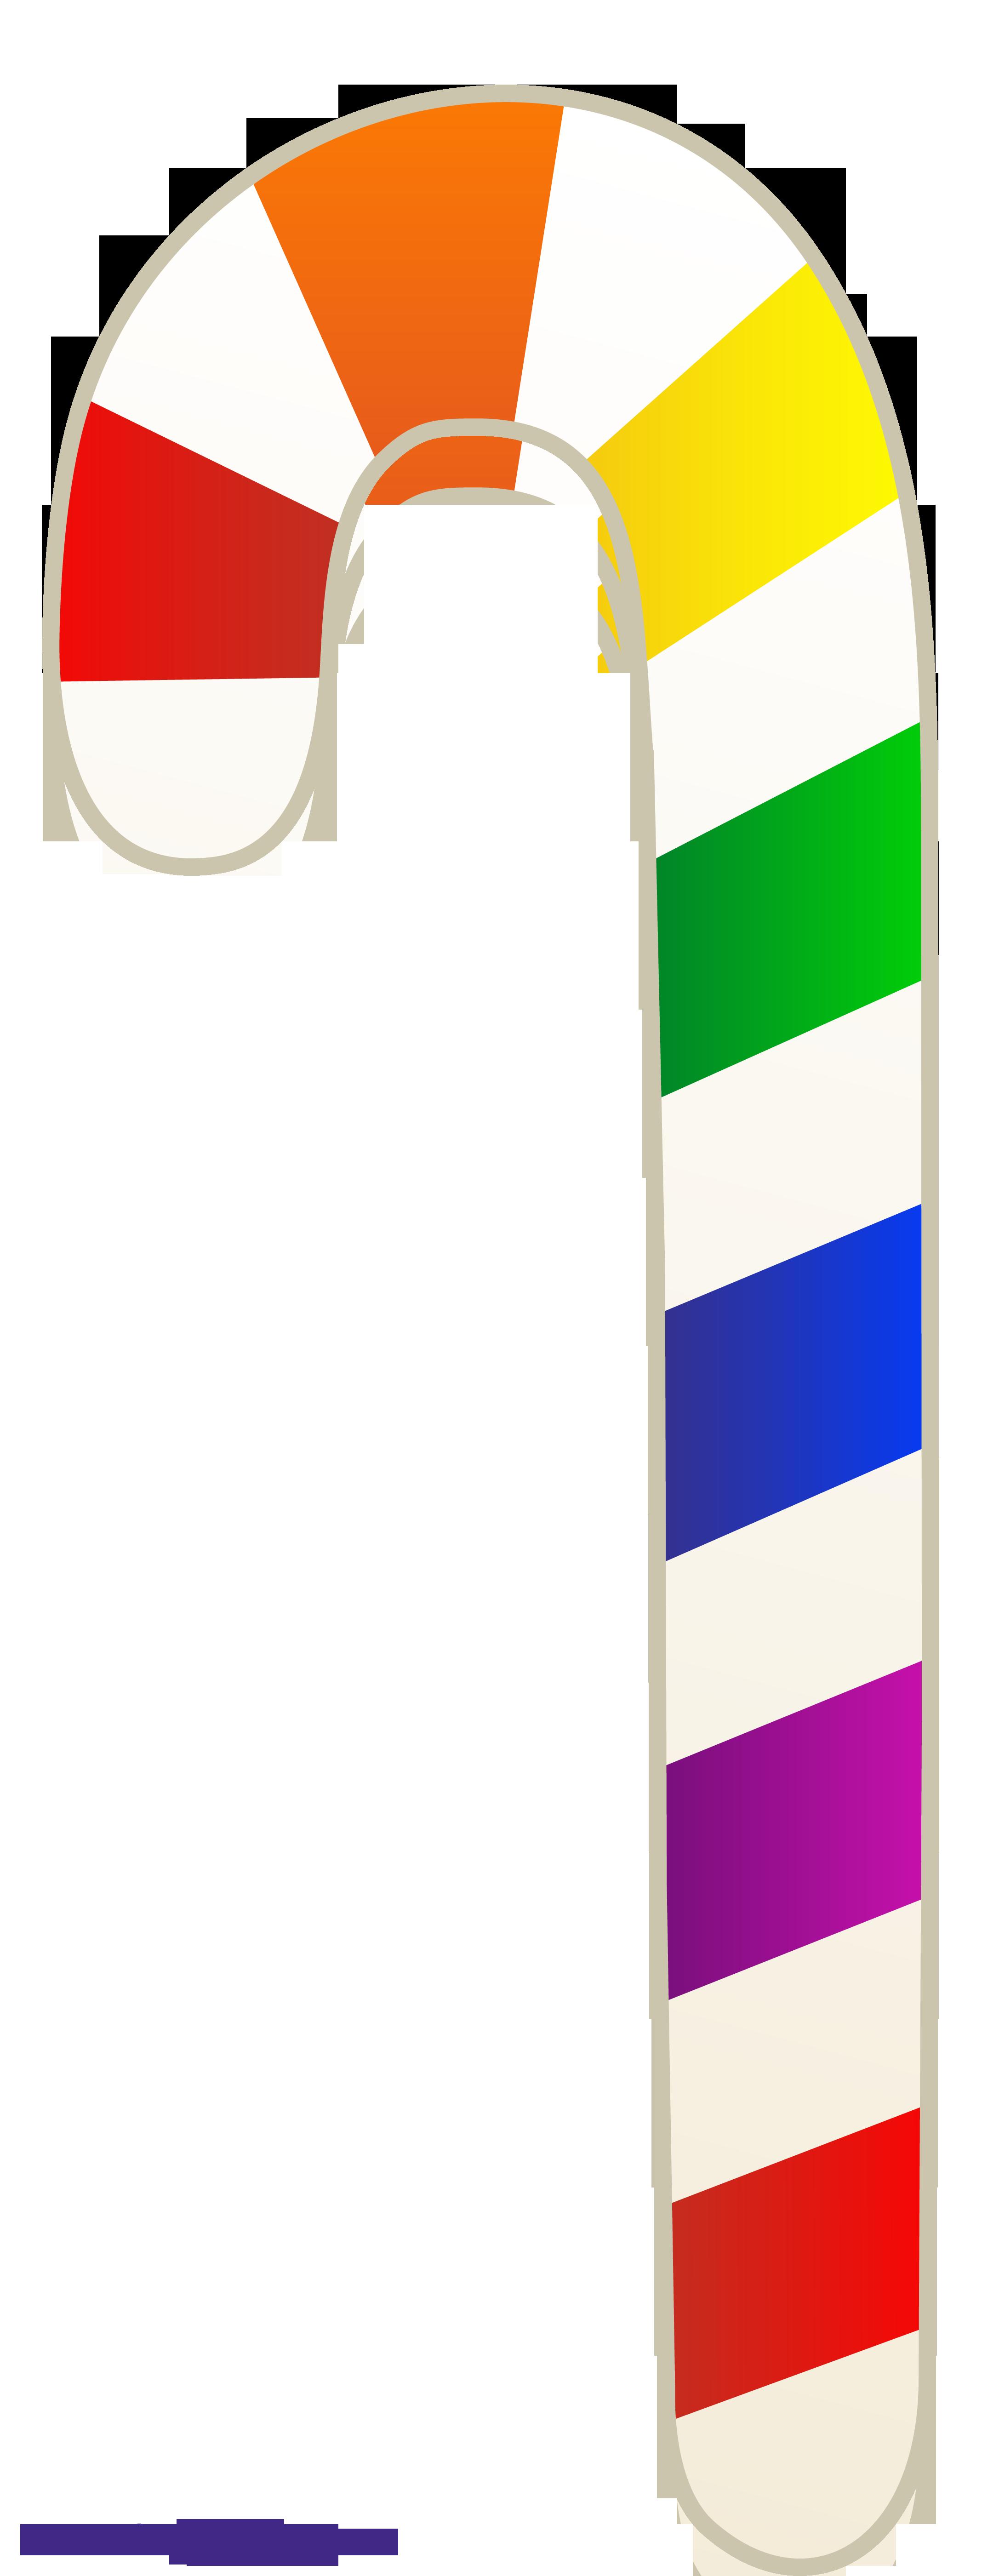 Cane sweet clip art. Clipart rainbow candy